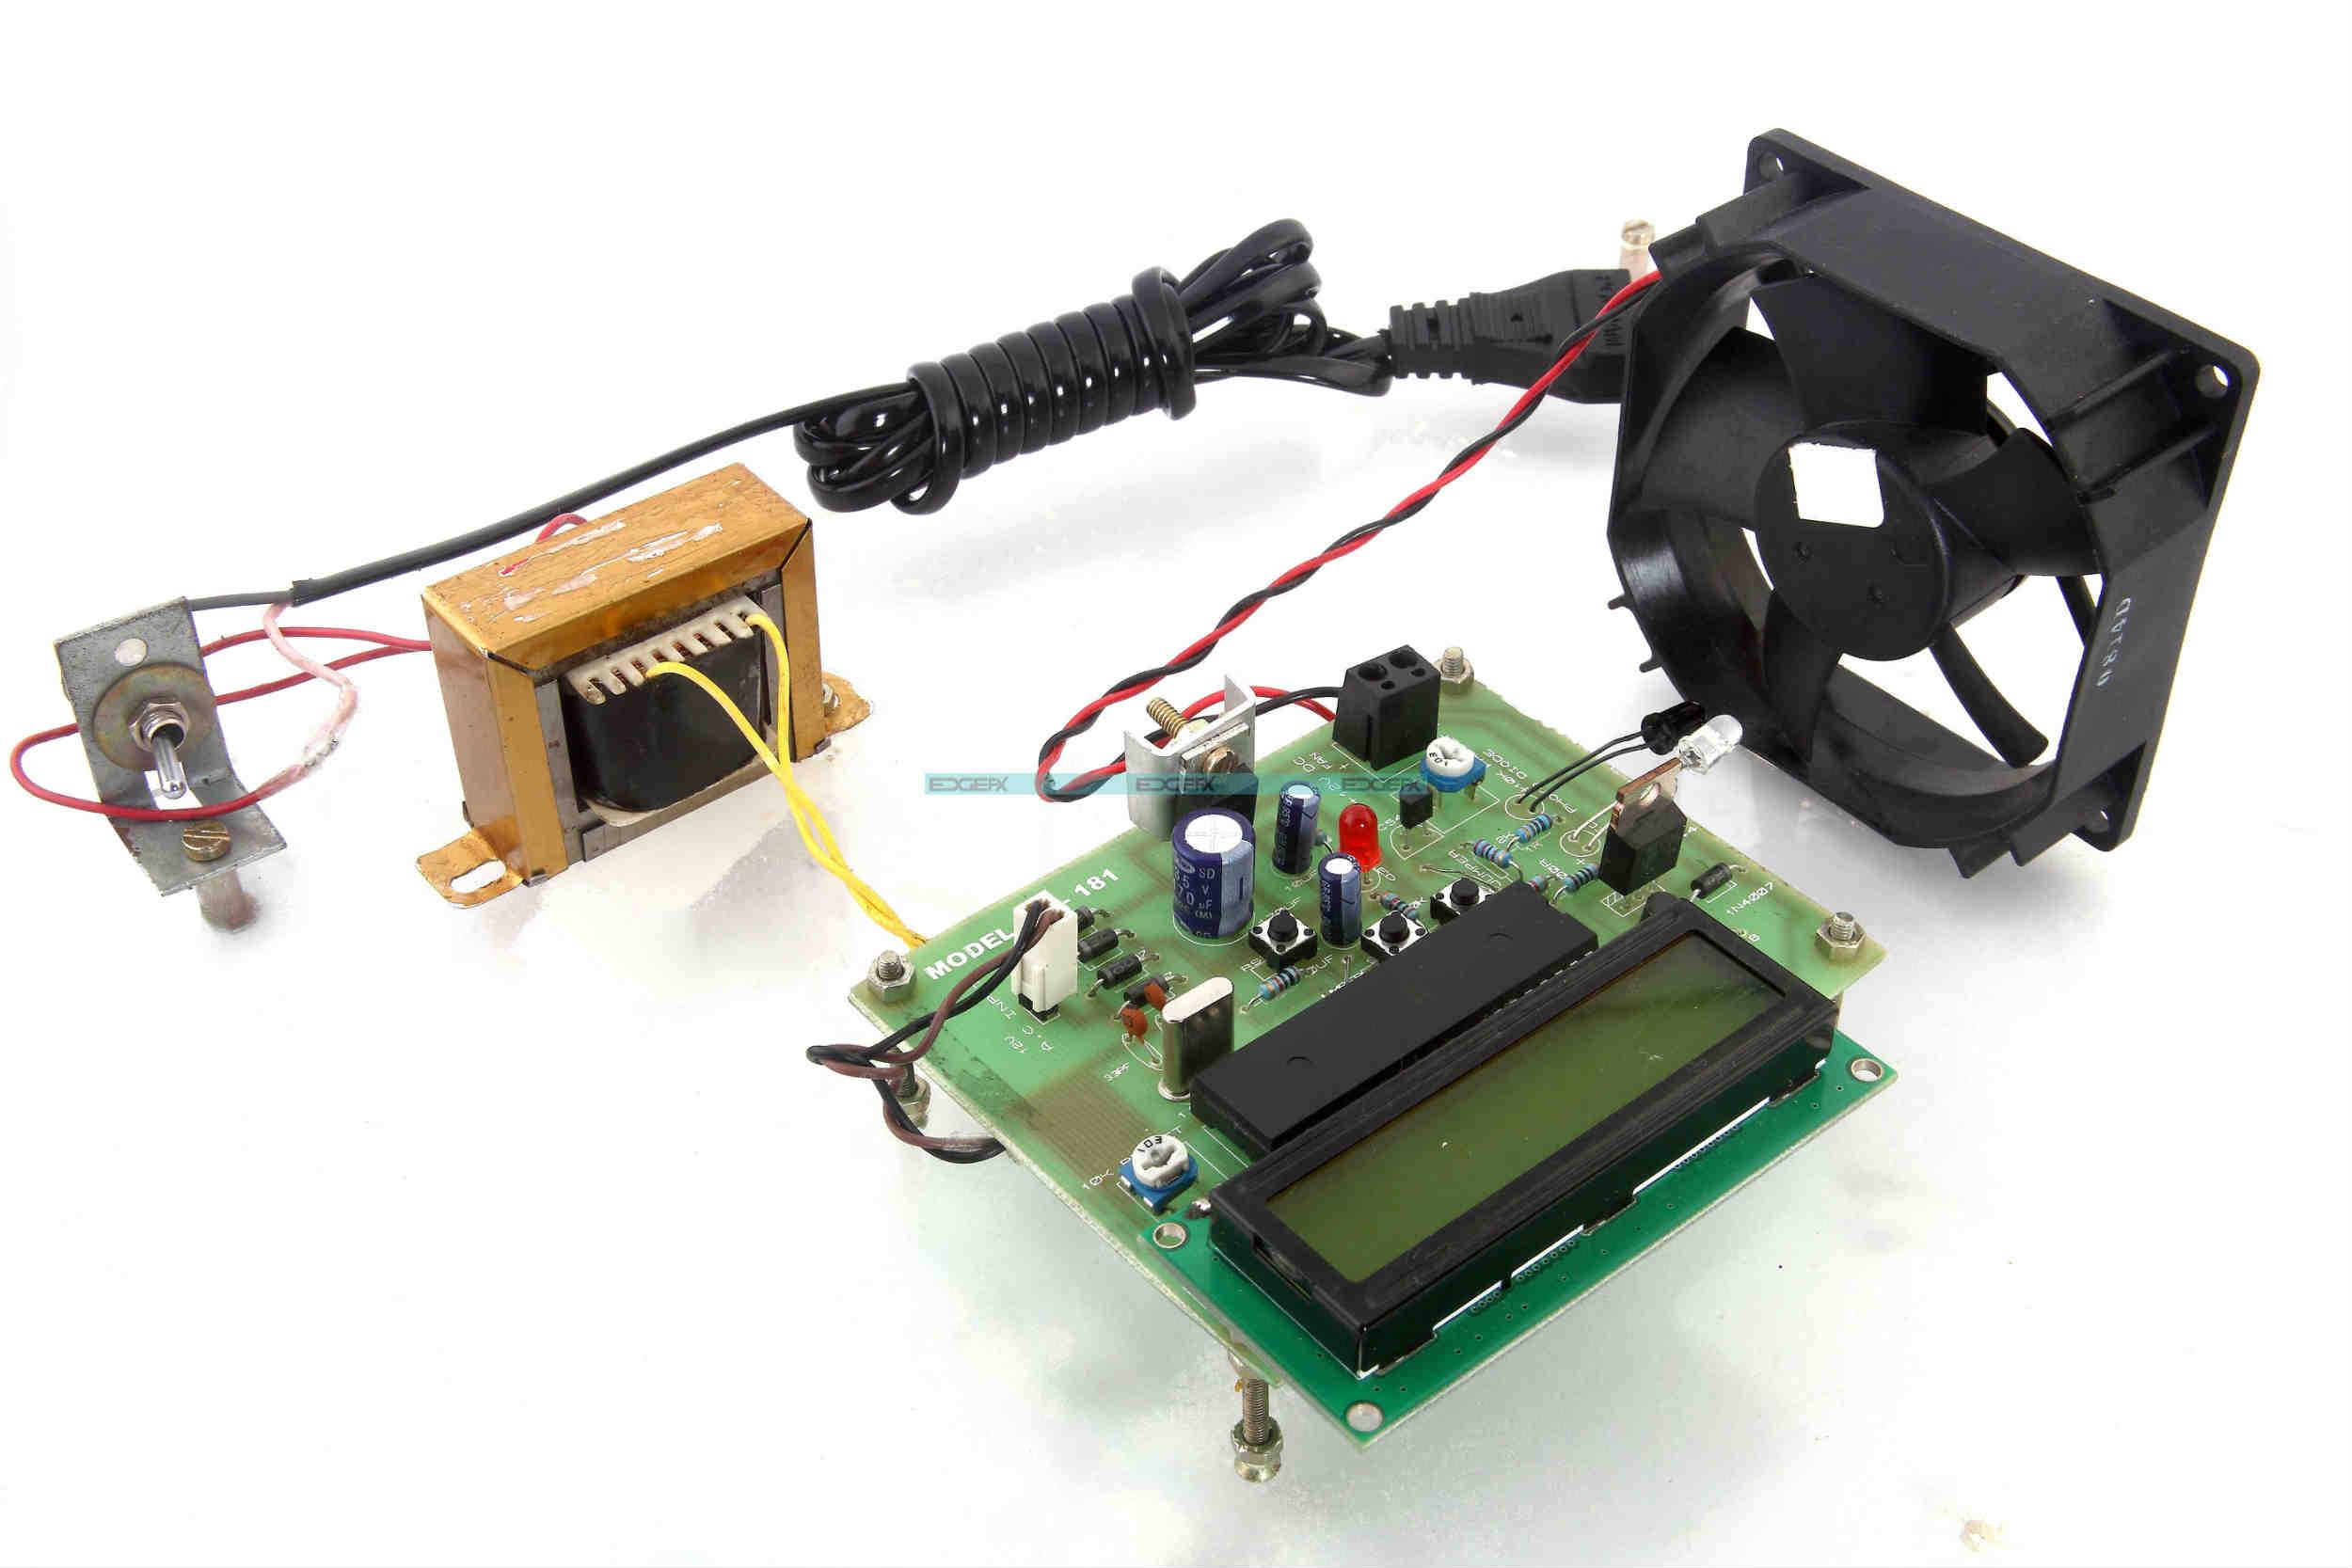 Circuit Diagram Of DC Motor Speed Control Using Microcontroller